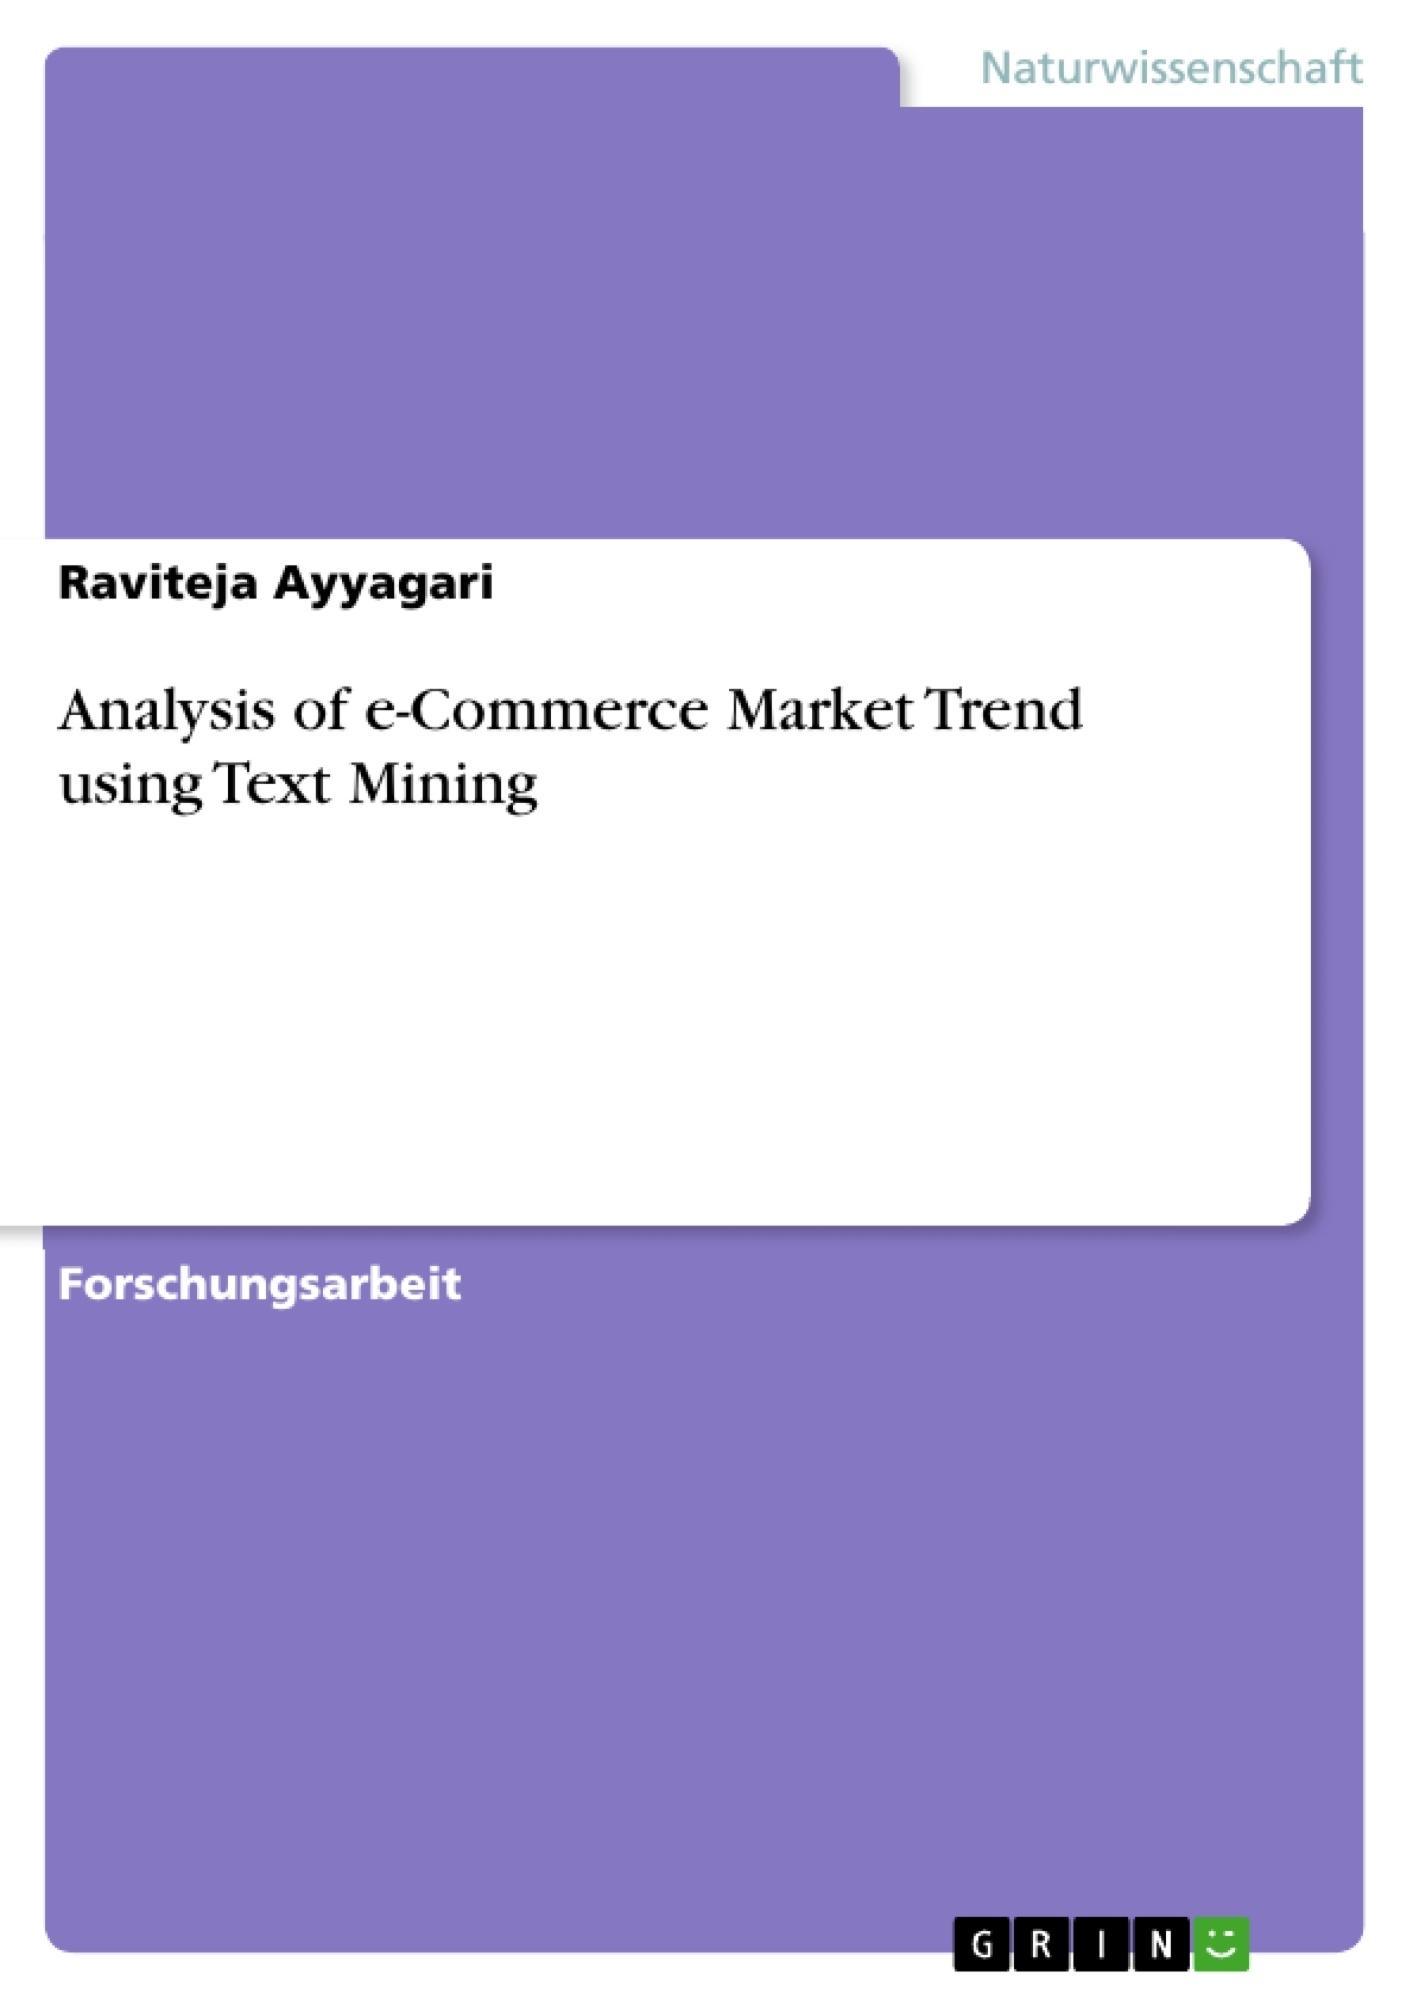 Titel: Analysis of e-Commerce Market Trend using Text Mining